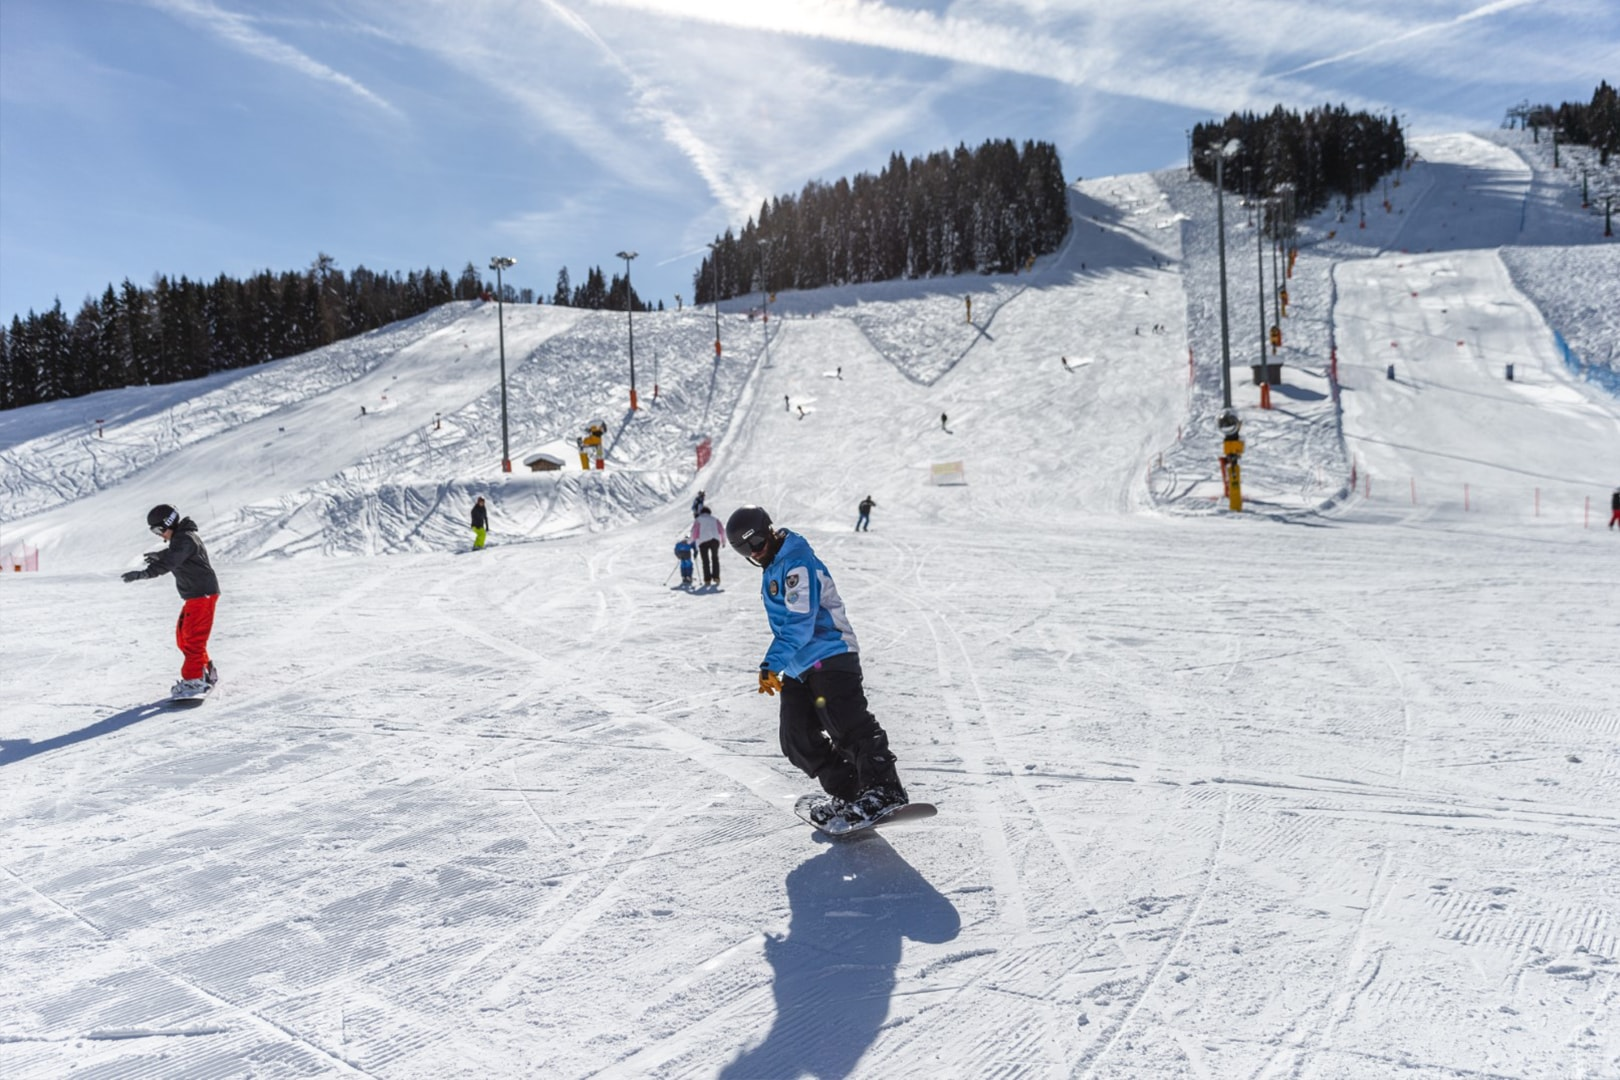 ski area Funivie Lagorai a Passo Brocon 6